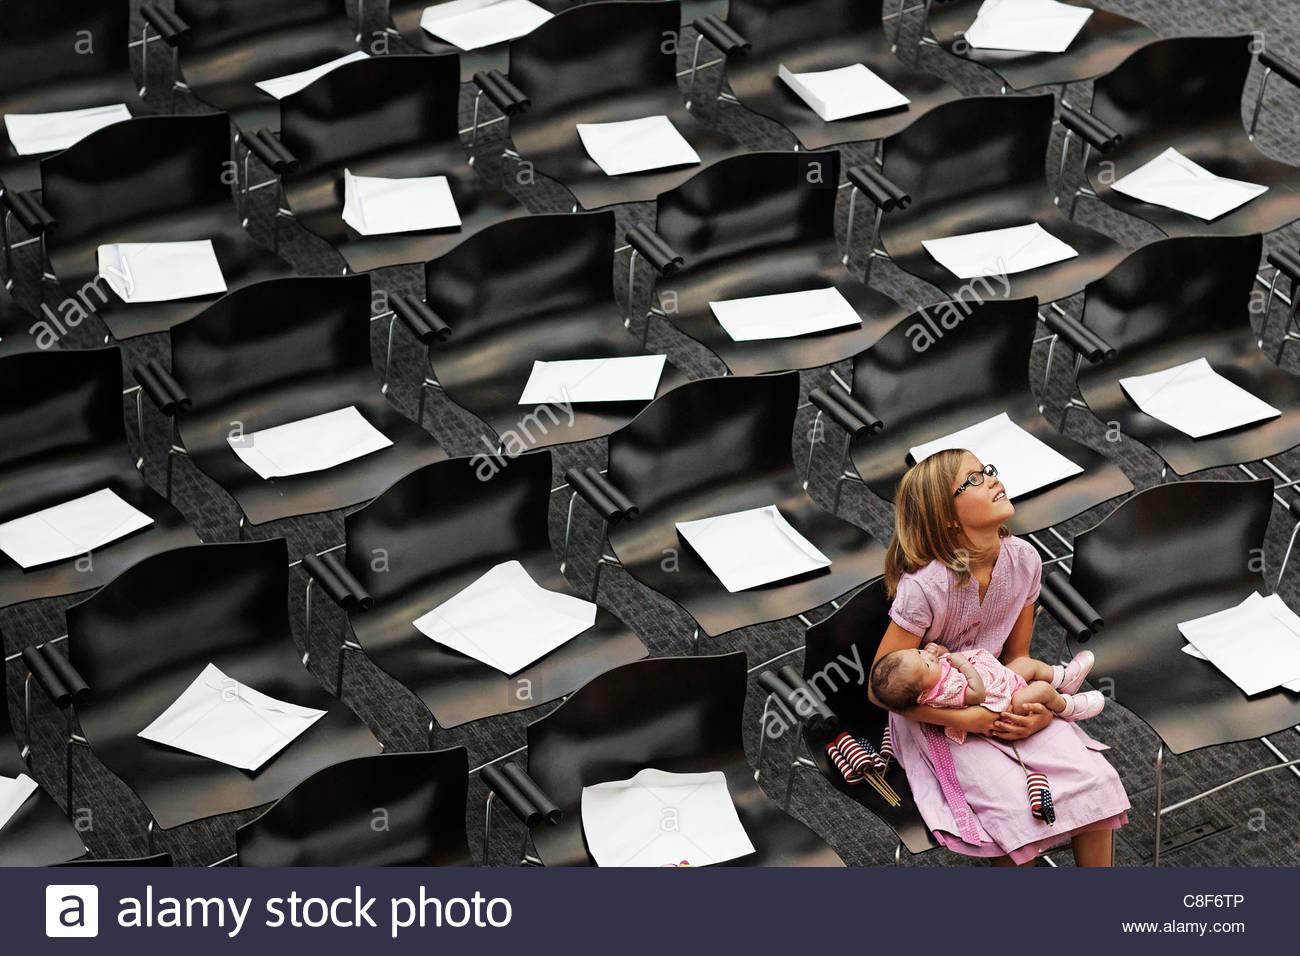 Australian children await a naturalization ceremony in Phoenix. - Stock Image